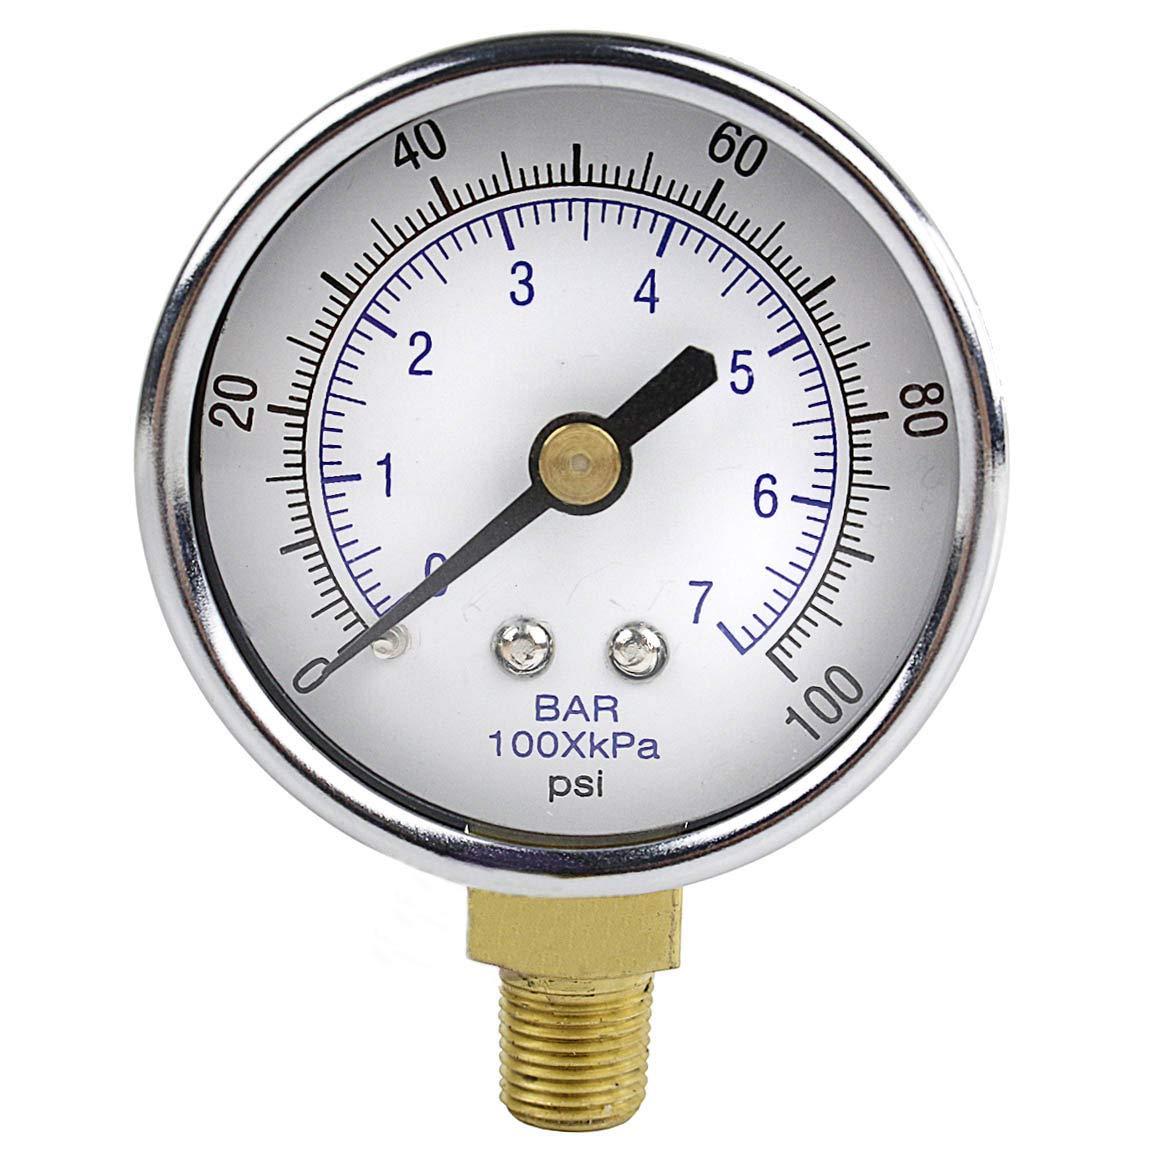 Bottom Mount Pressure Gauge NPT Air Compressor 0-300 PSI Display Part 1//4 in